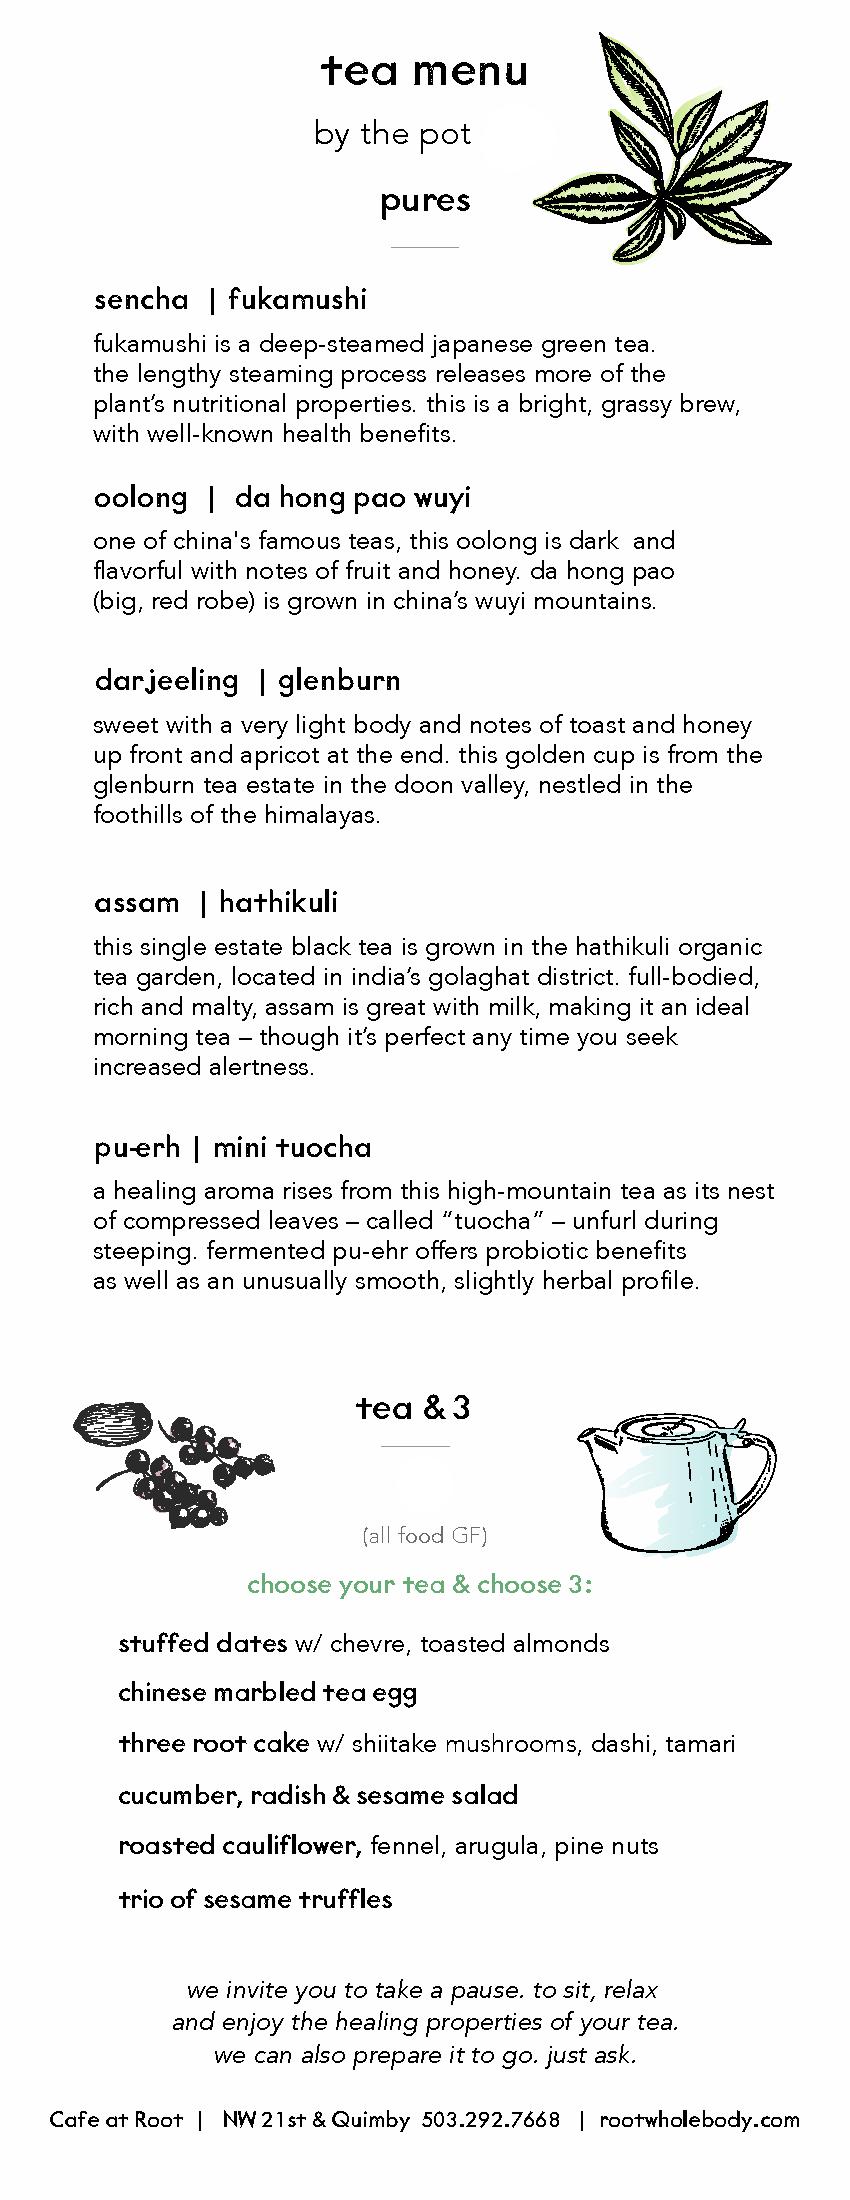 Root Cafe - Tea Menu - Side 1